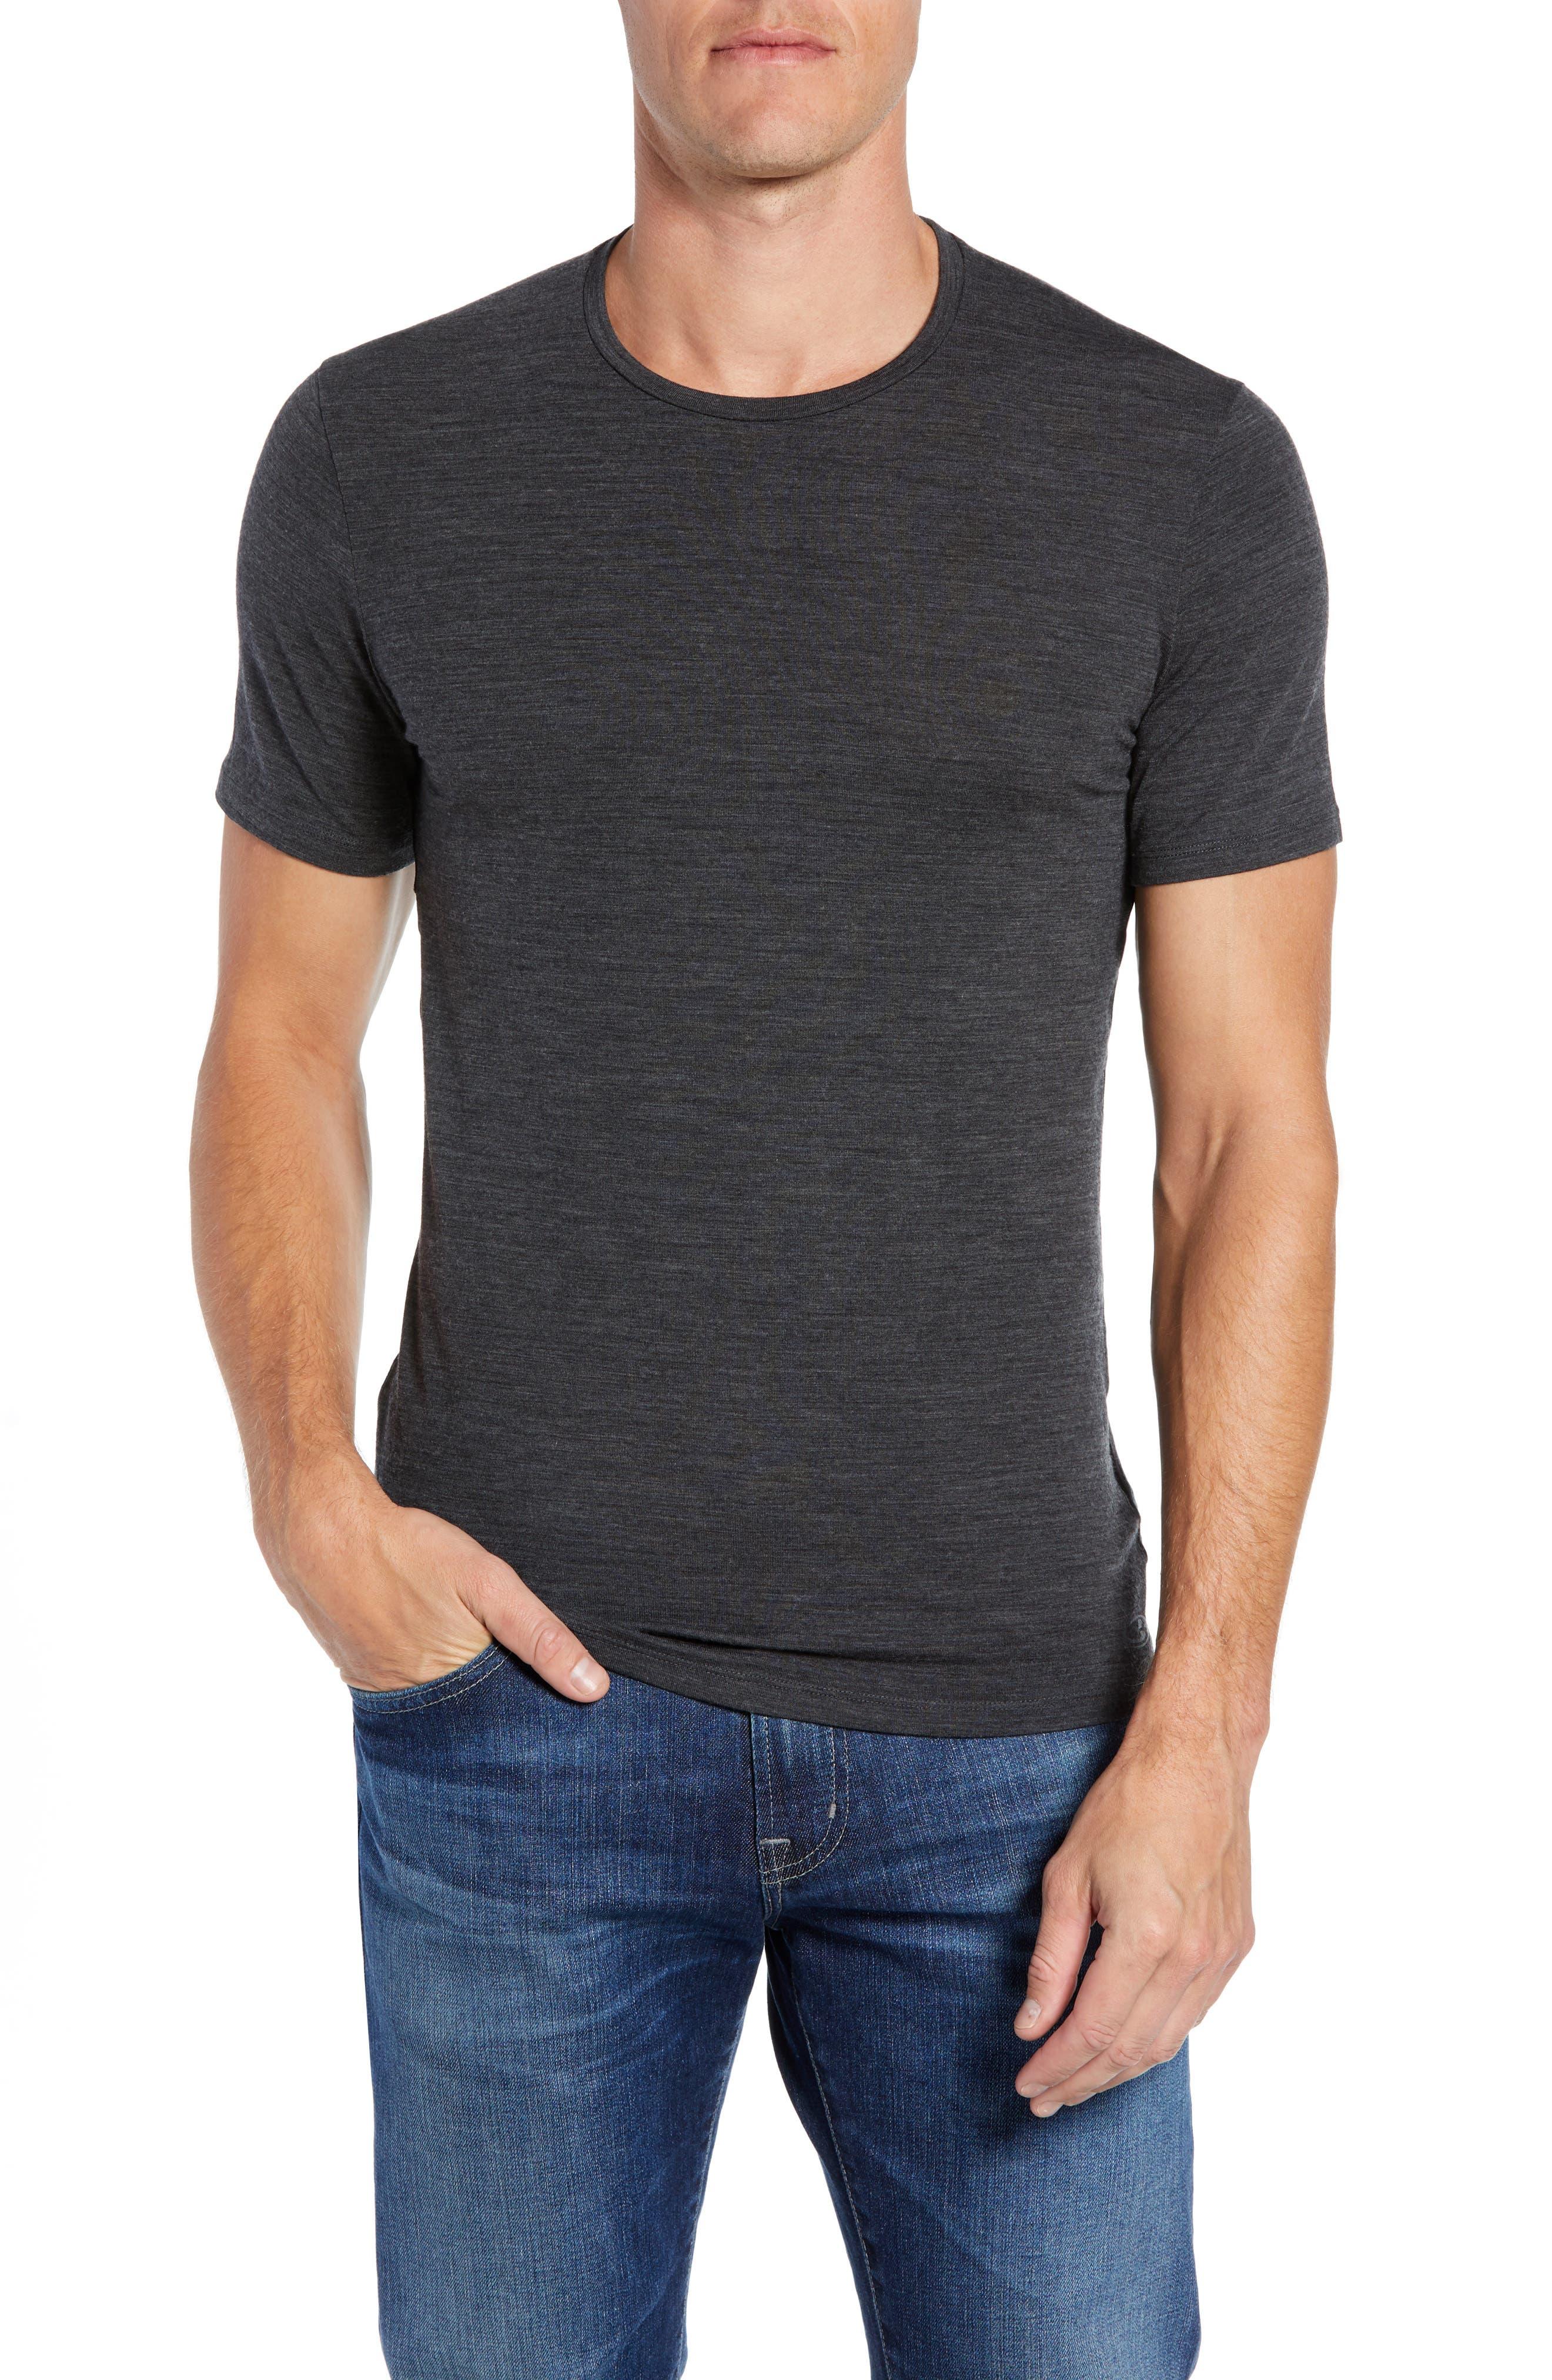 Anatomica Short Sleeve Crewneck T-Shirt,                         Main,                         color, JET HEATHER/ BLACK